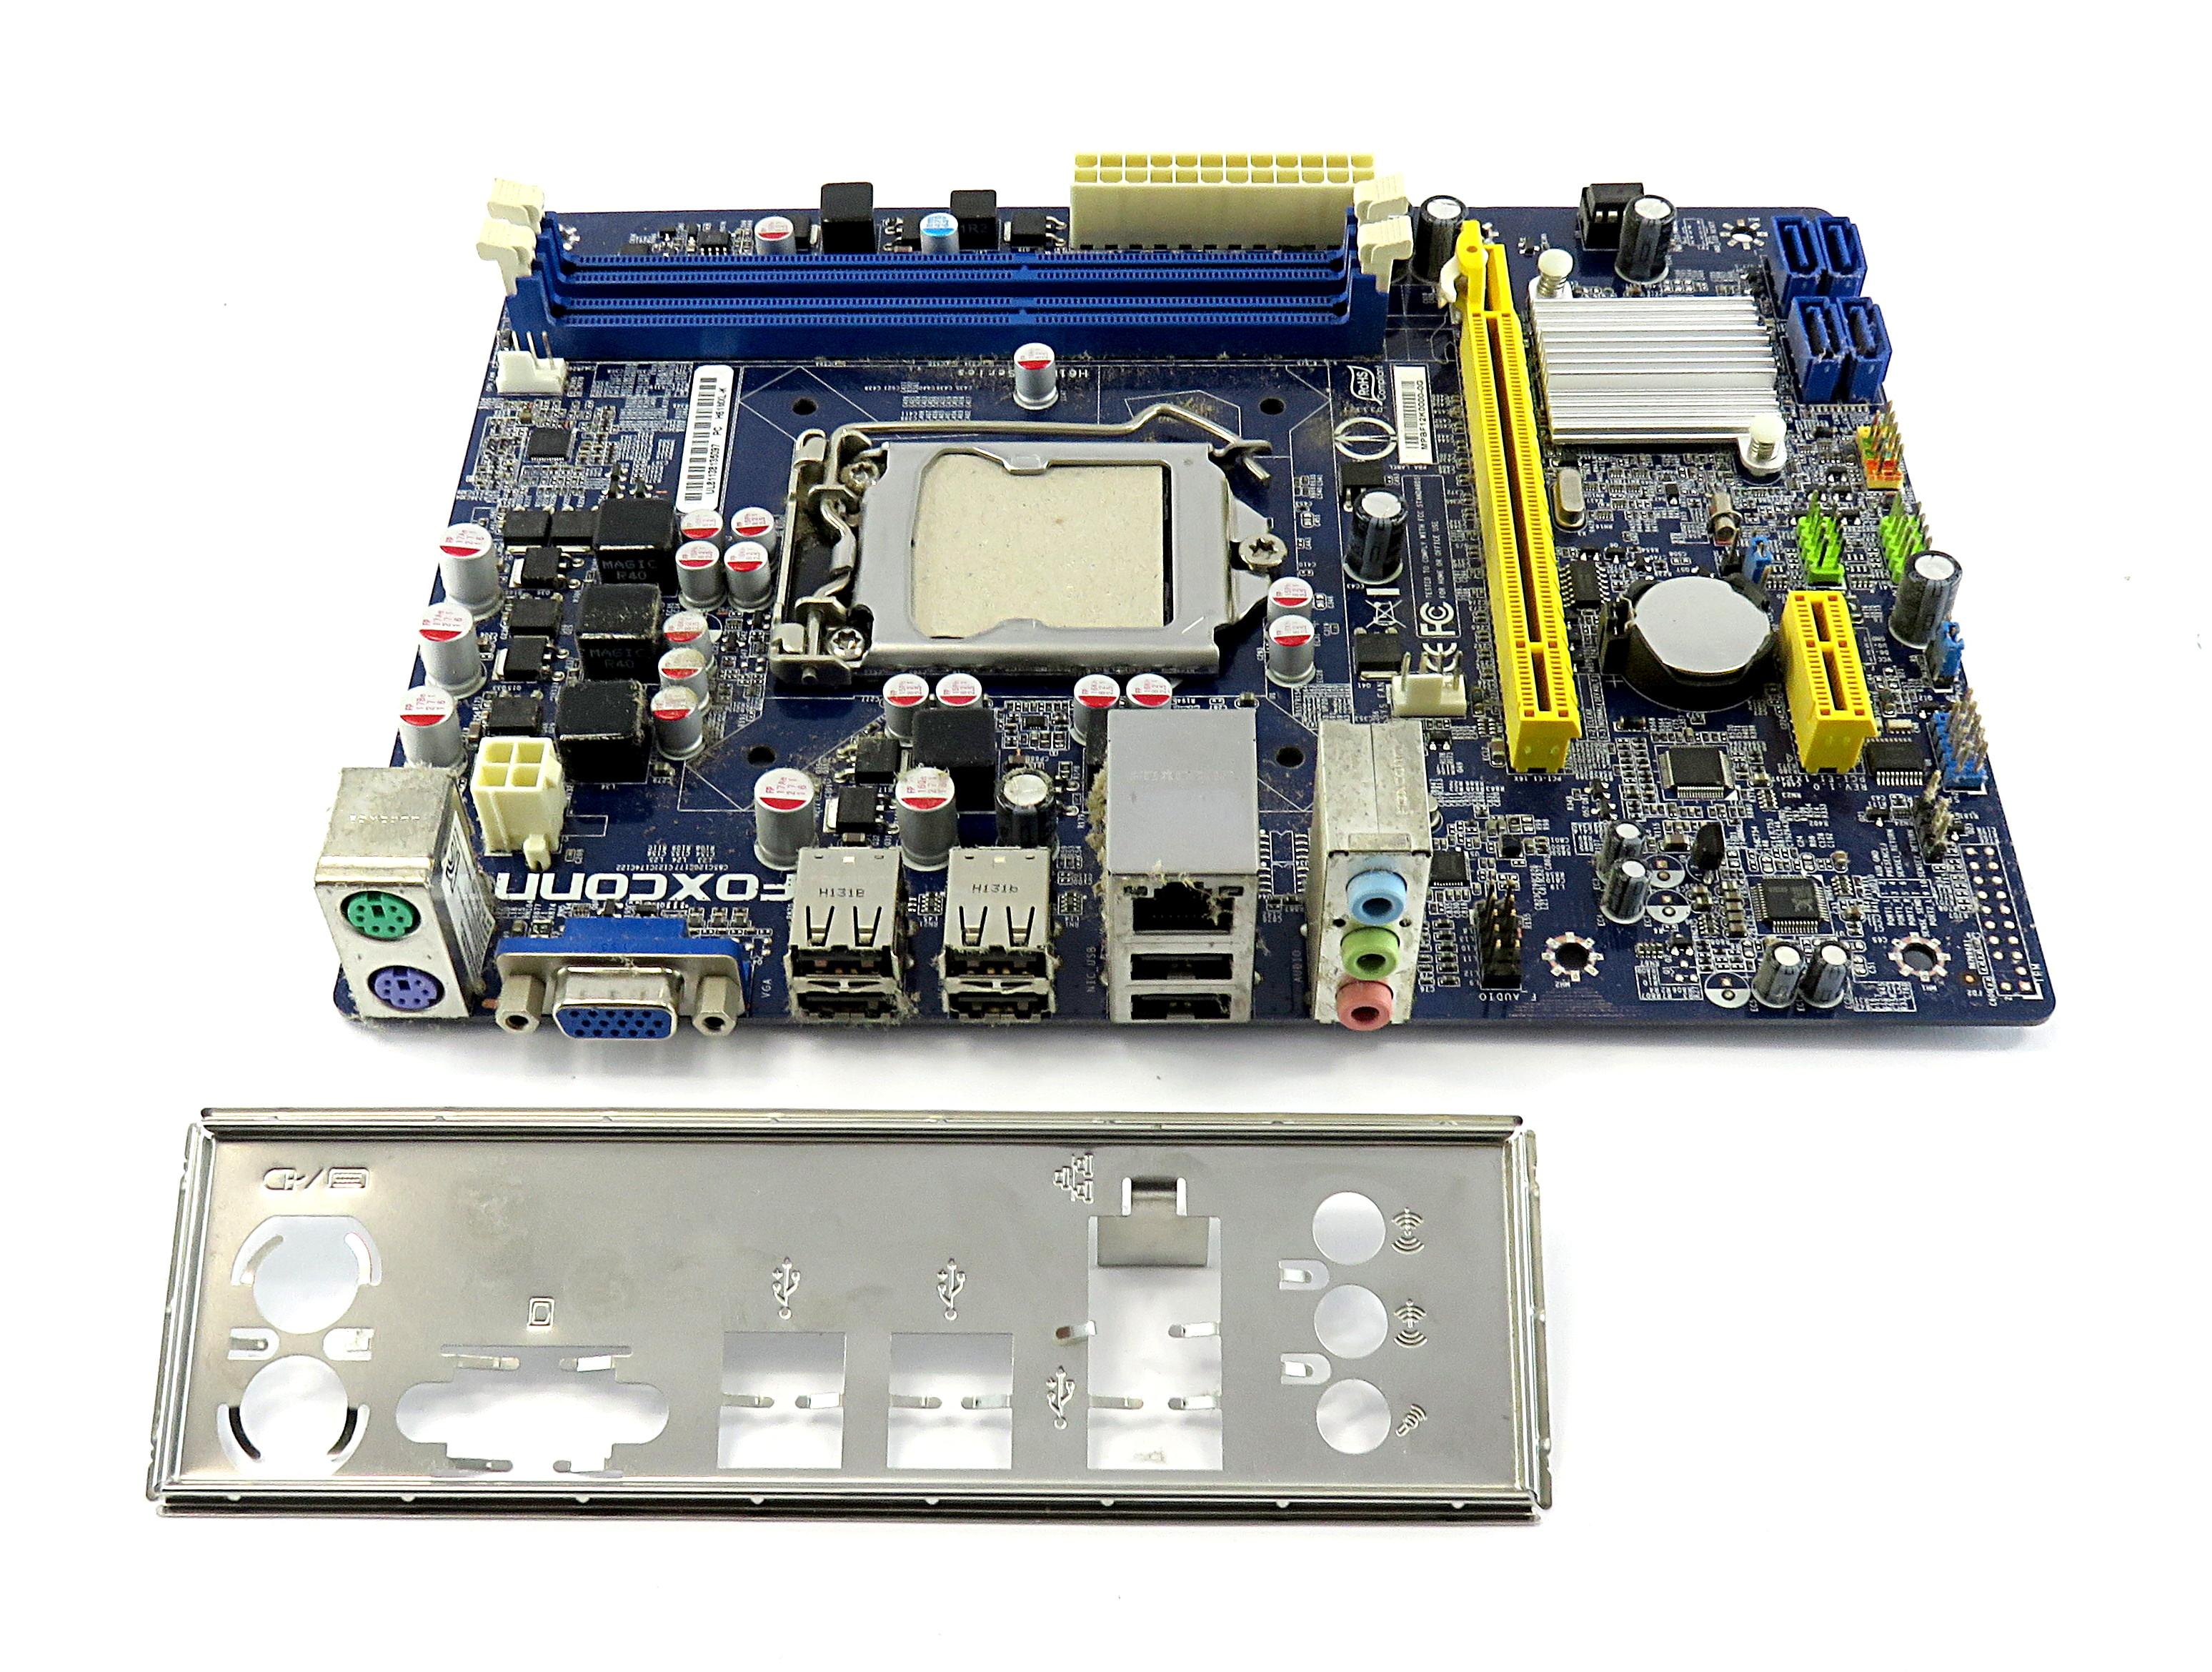 H61mxl k foxconn socket lga1155 intel h61 chipset ddr3 motherboard h61mxl k foxconn socket lga1155 intel h61 chipset ddr3 motherboard fandeluxe Images